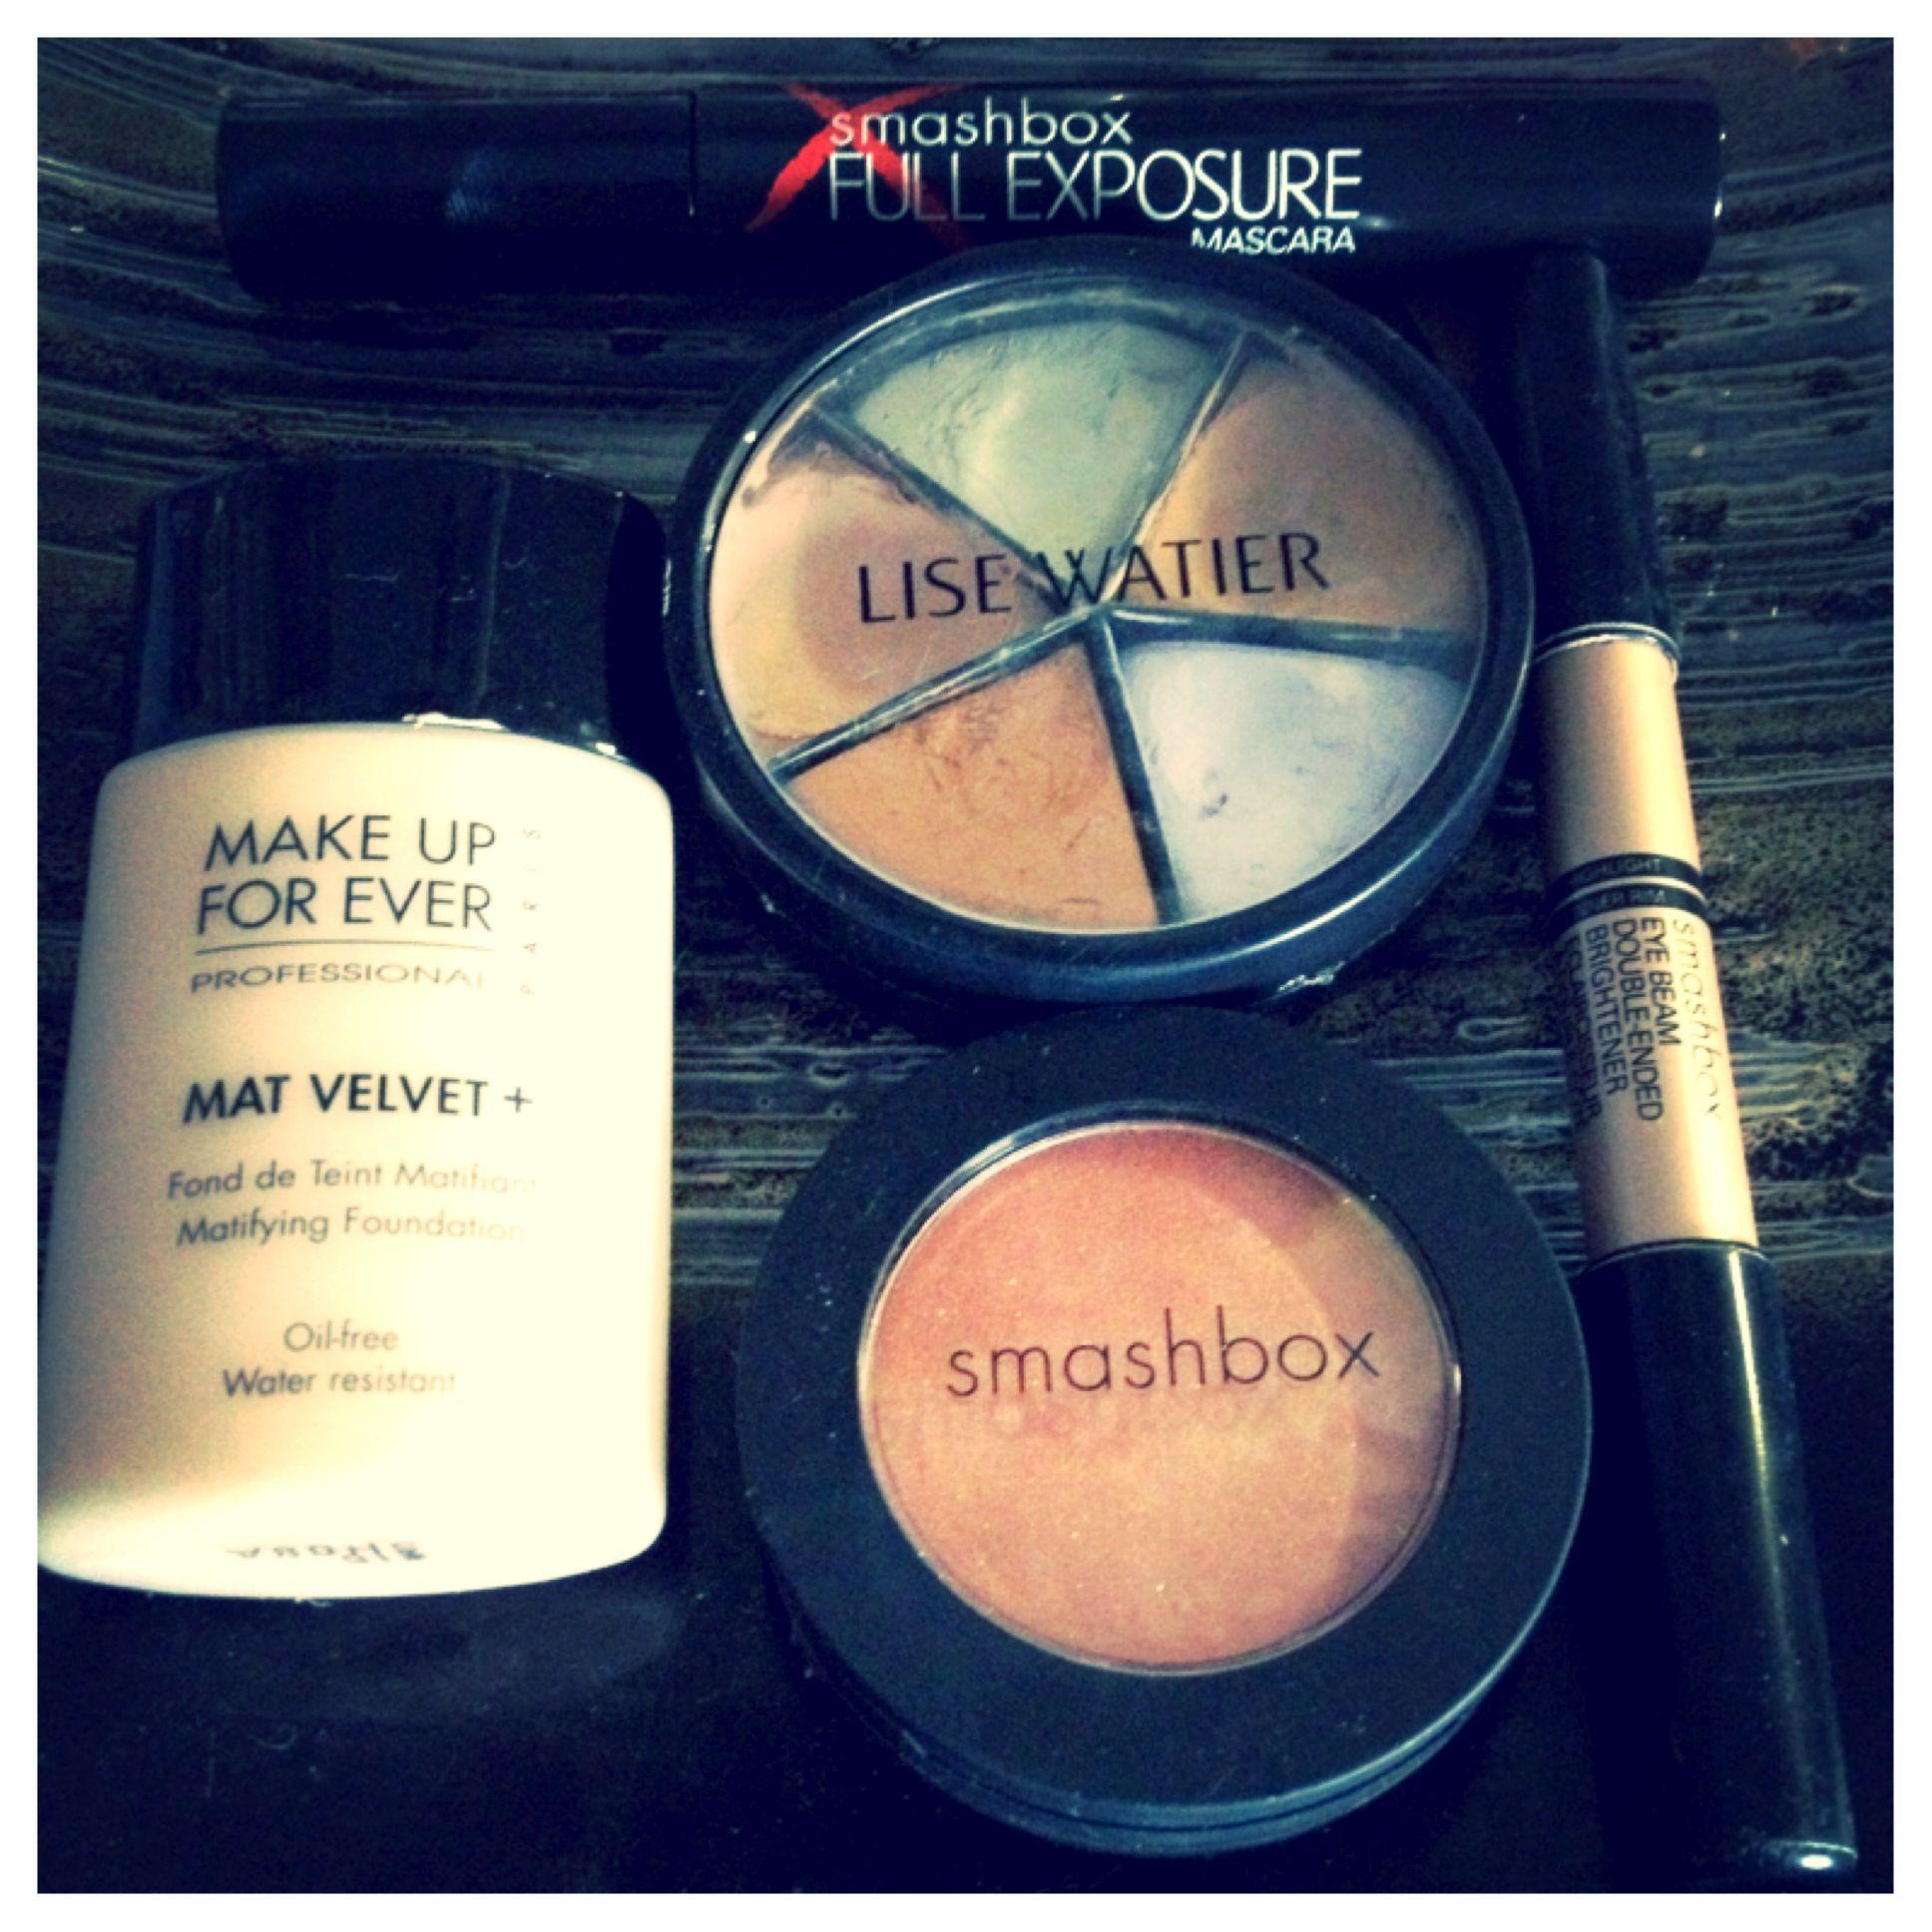 Beauty basics • foundation, concealer, blush, and